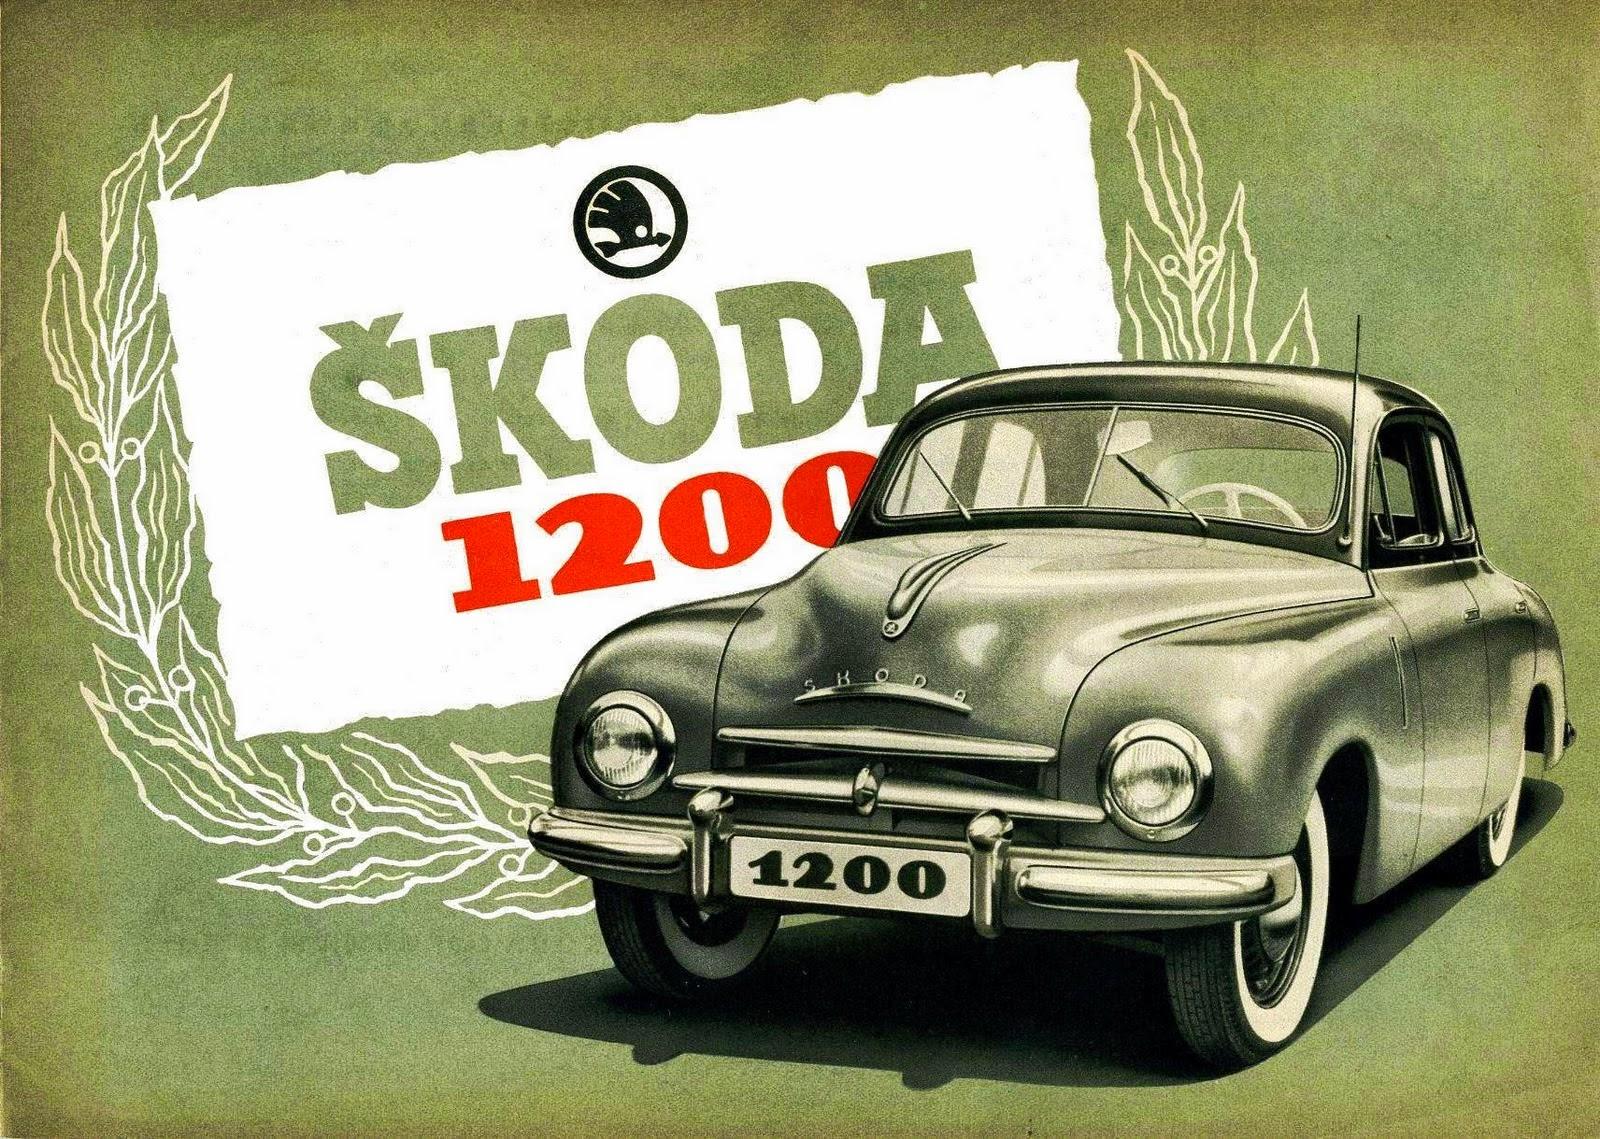 Skoda 1200 I 1952 - 1973 Sedan #6